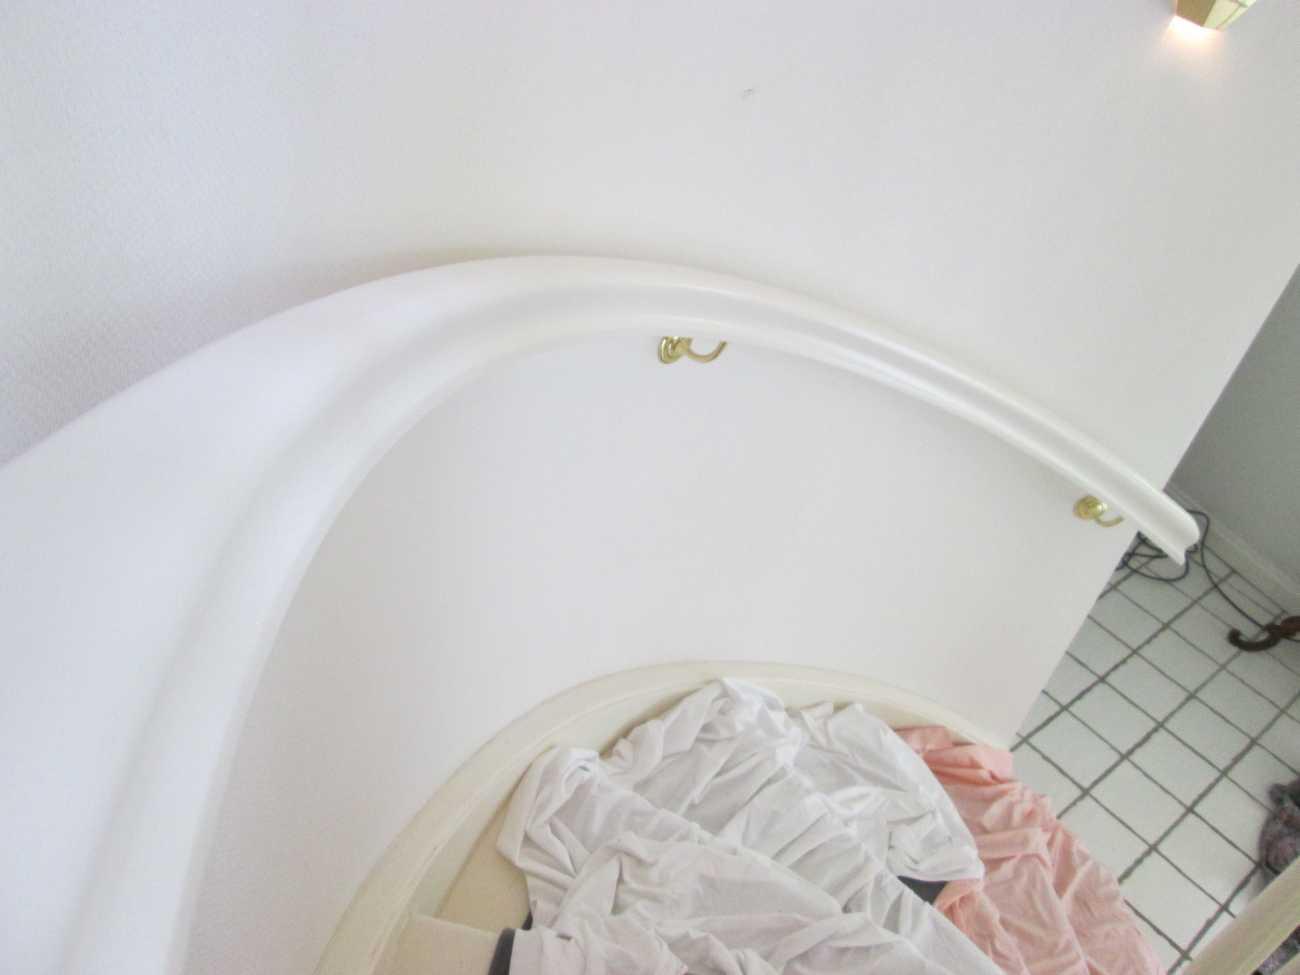 handlauf montage 013 tischlerei albers. Black Bedroom Furniture Sets. Home Design Ideas